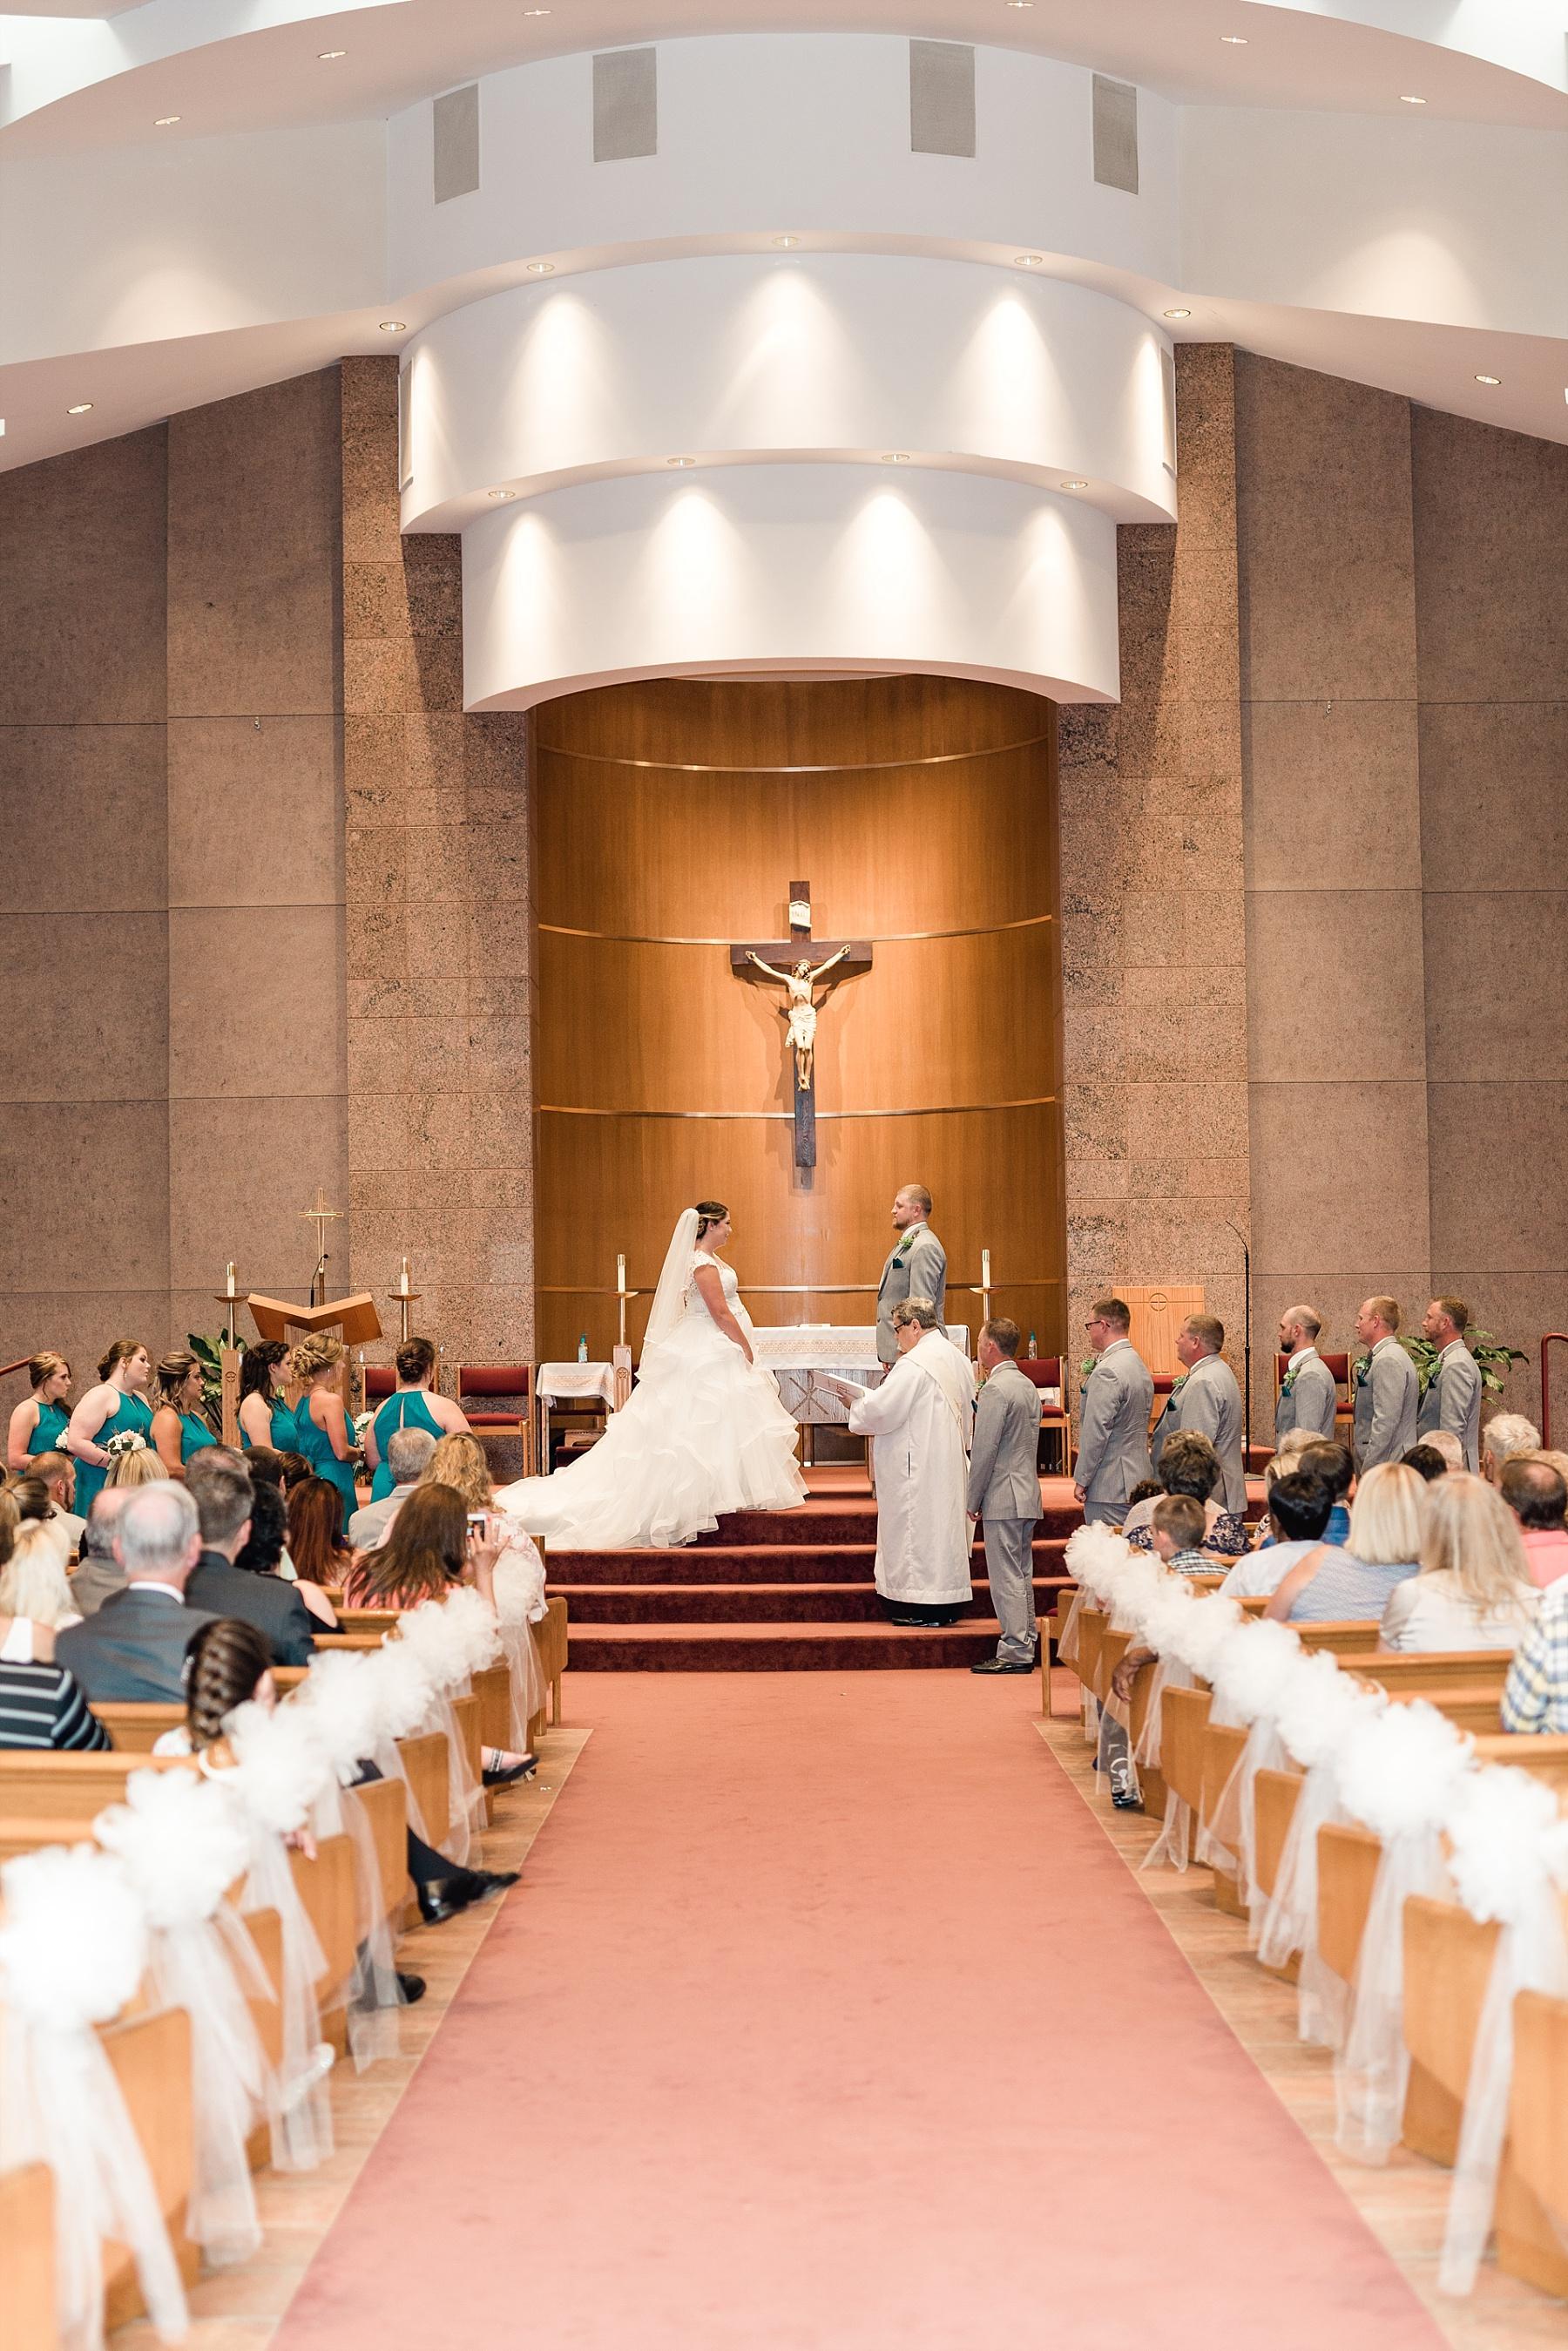 Baurichter Wedding at Stoney Creek Inn Columbia Missouri by Kelsi Kliethermes Photography_0013.jpg